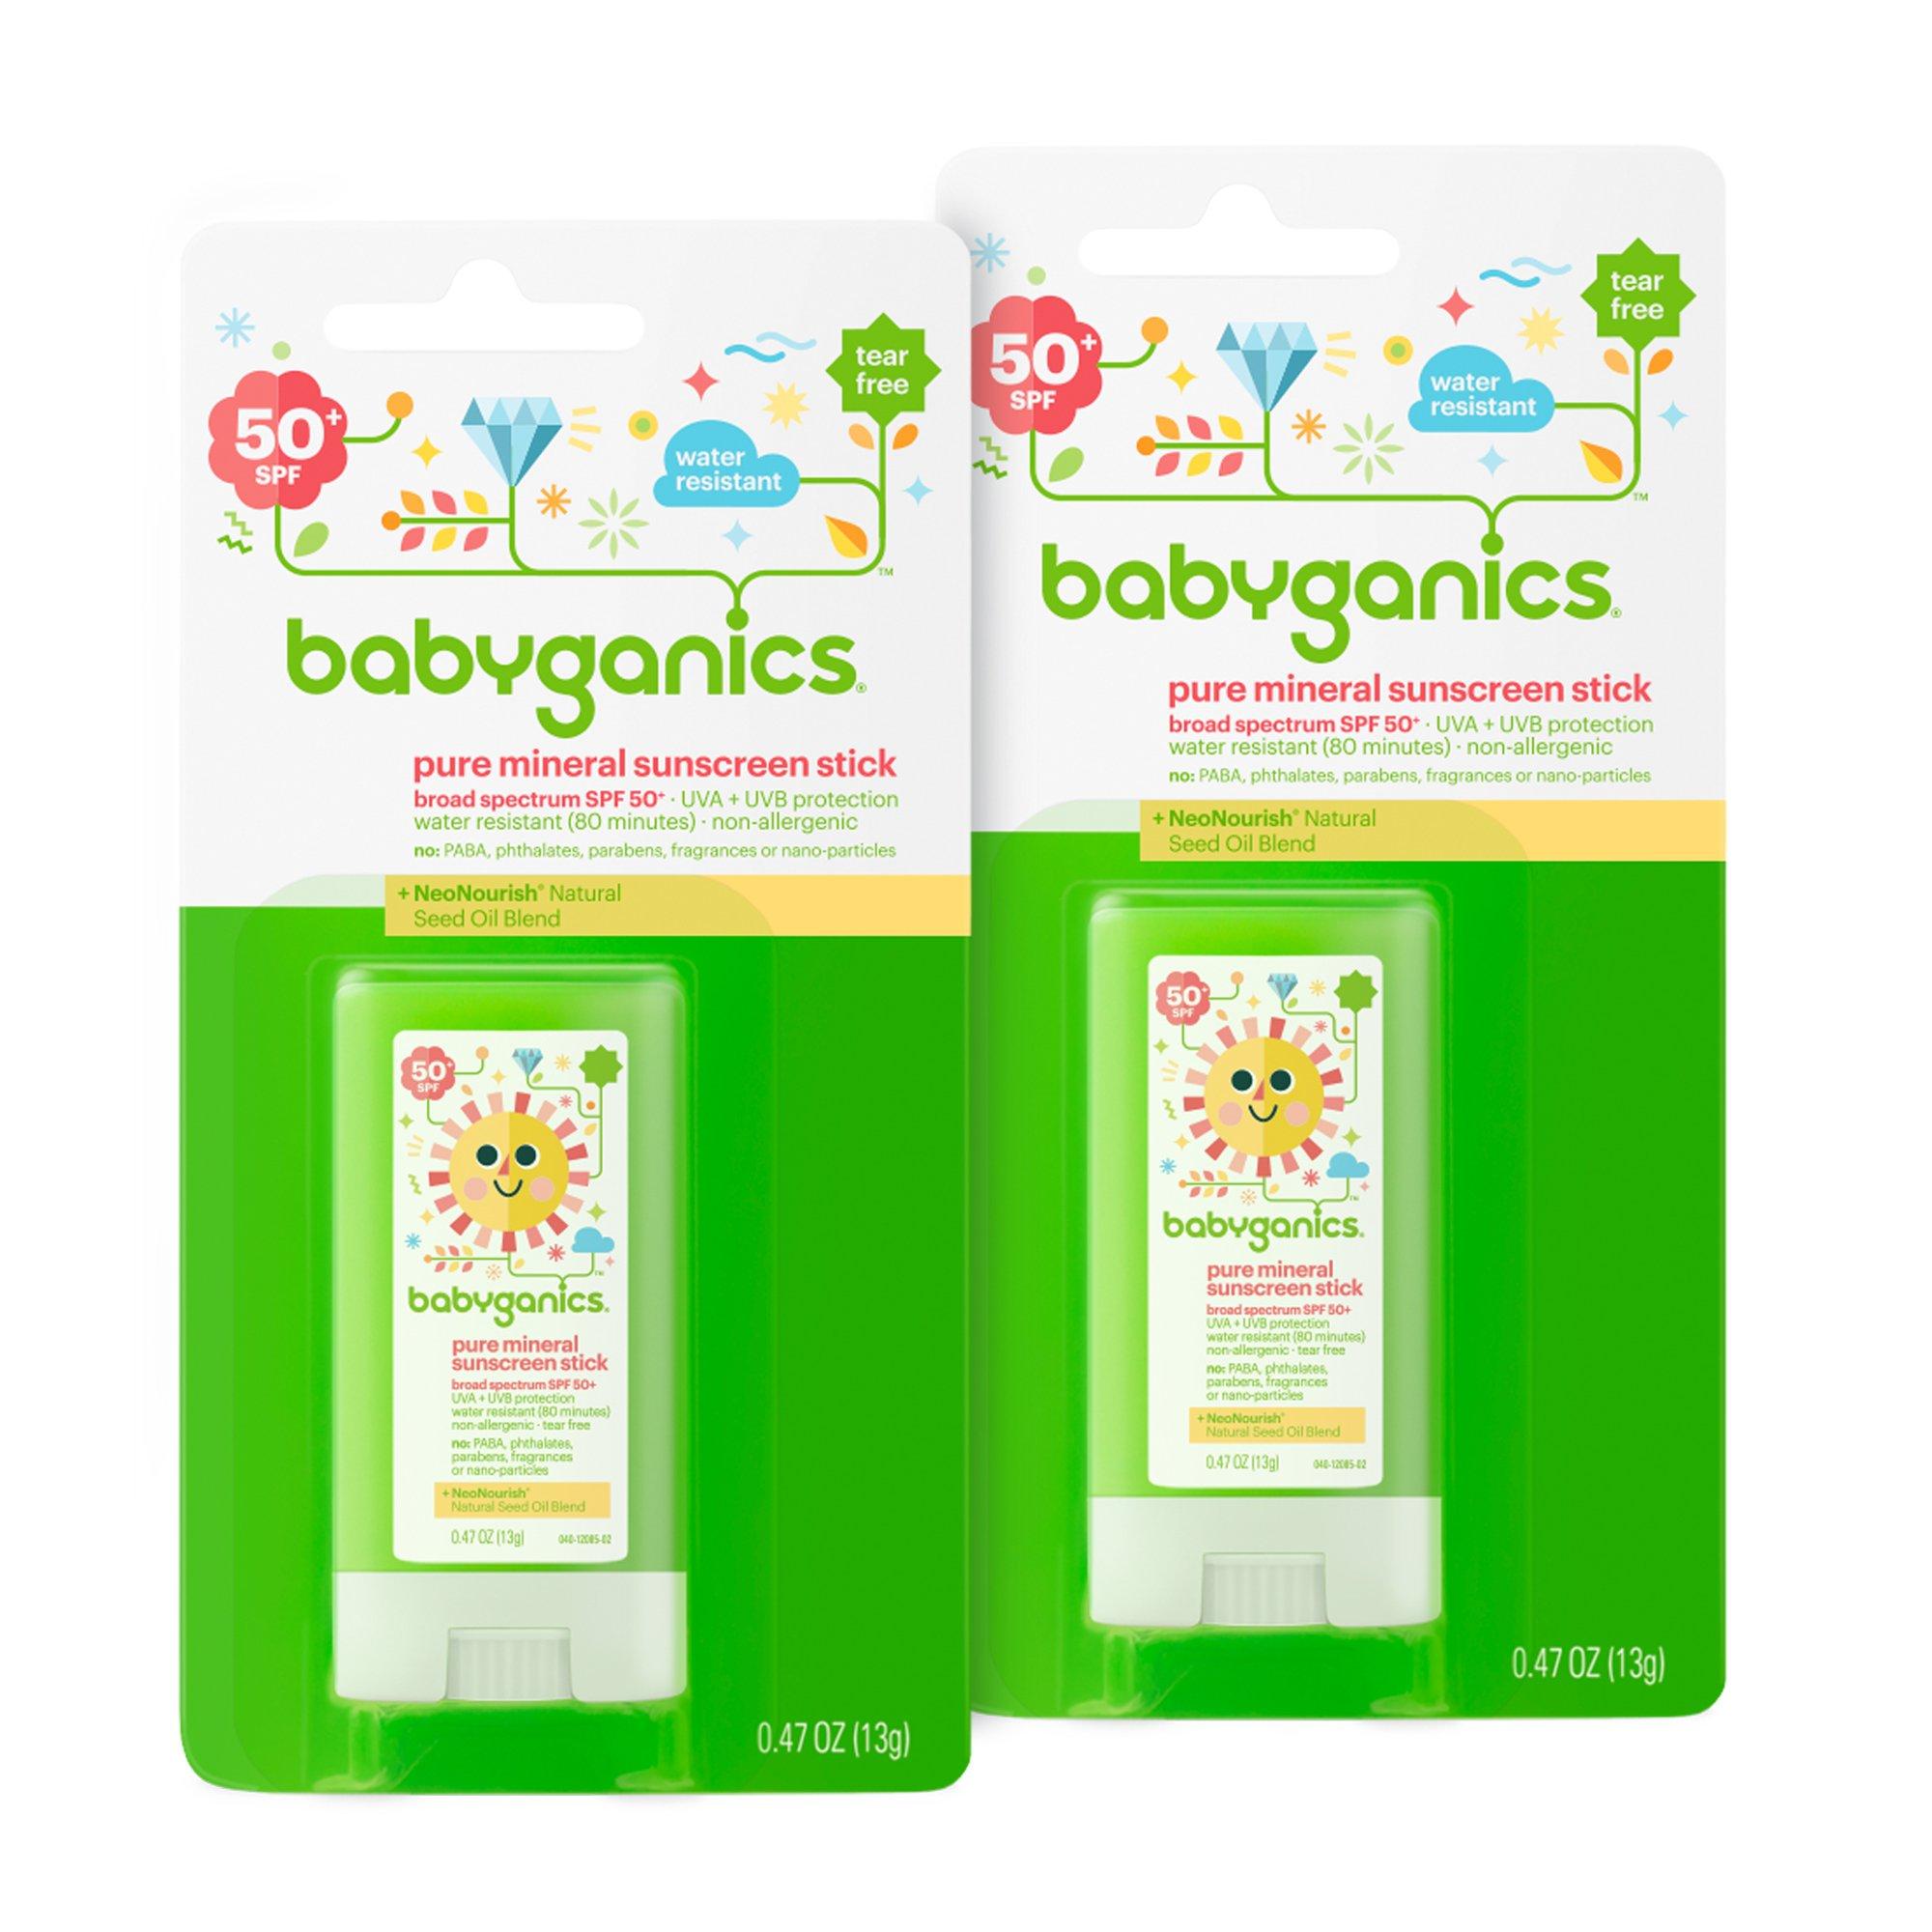 Babyganics Pure Mineral Sunscreen Stick SPF 50, .47oz Stick (Pack of 2)